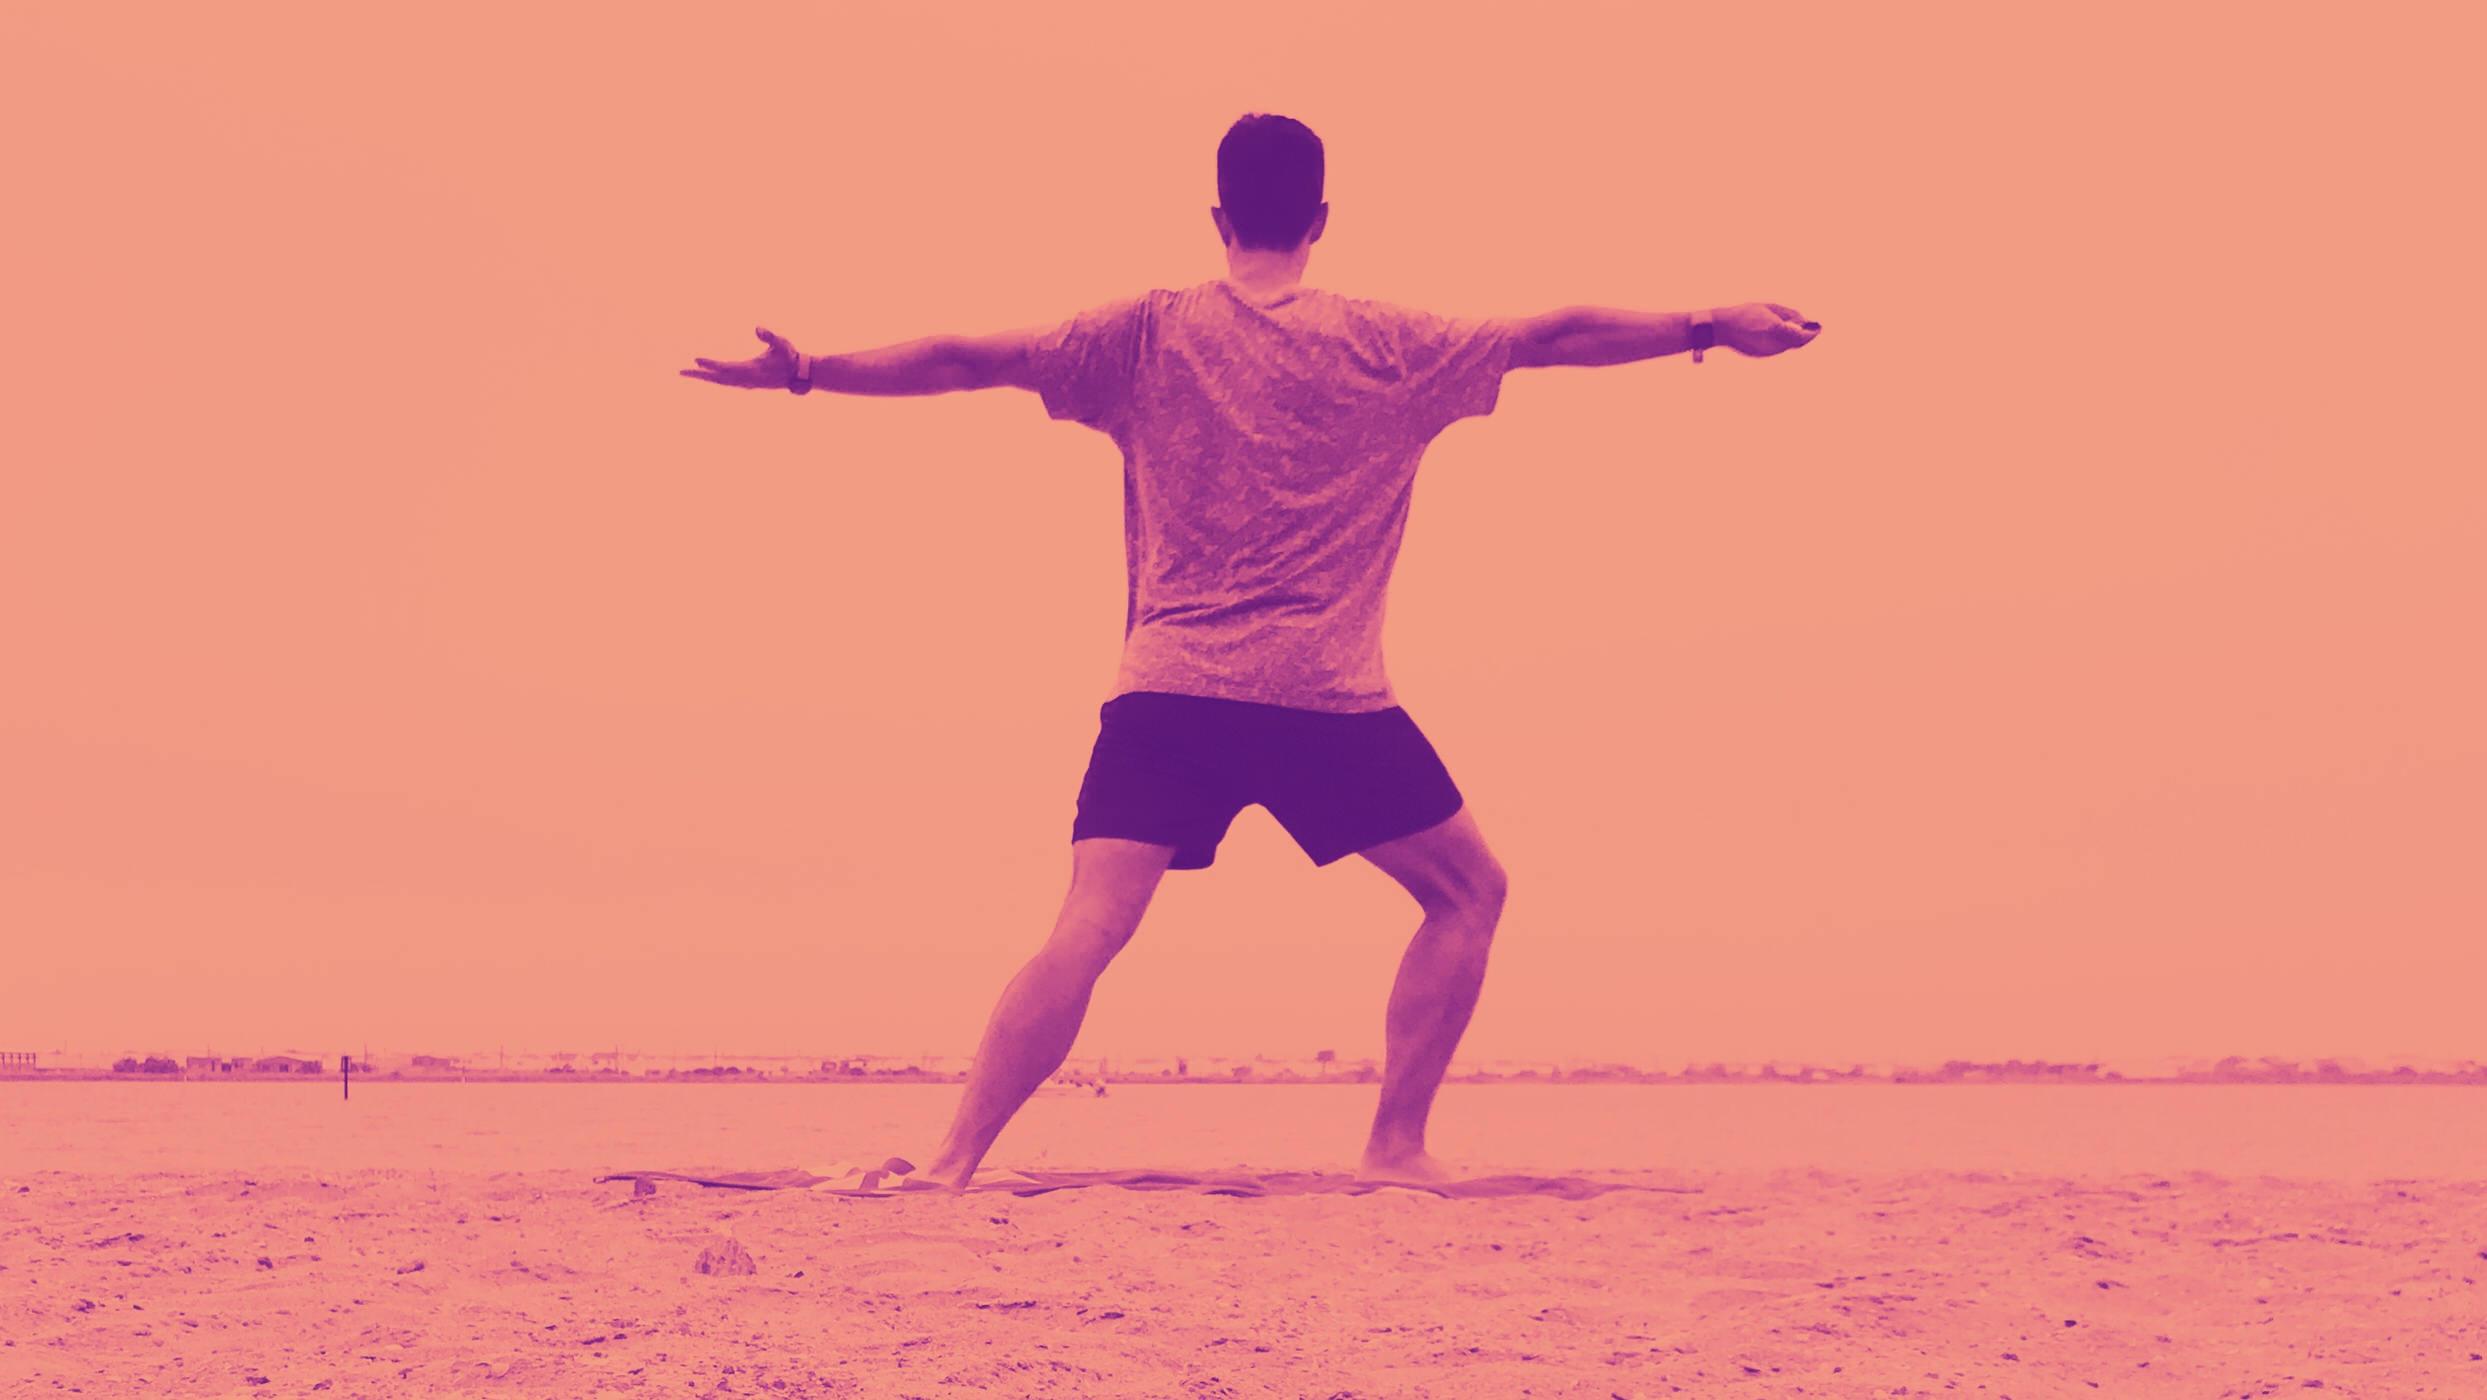 yoga running bertrandsoulier - KM 42 Podcast running par Bertrand Soulier